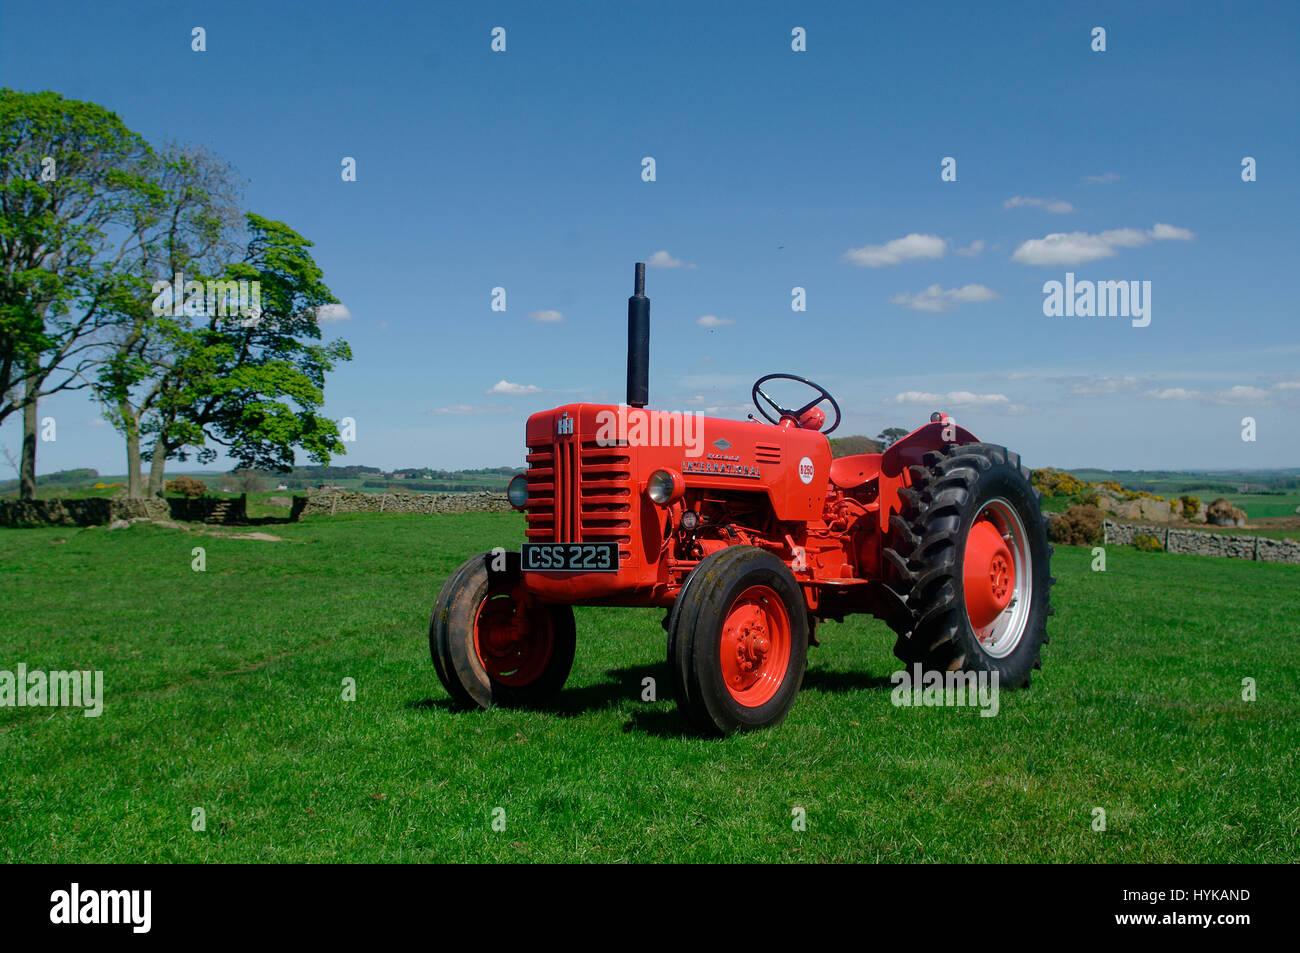 1957 McCormick International B-250 Tractor - Stock Image